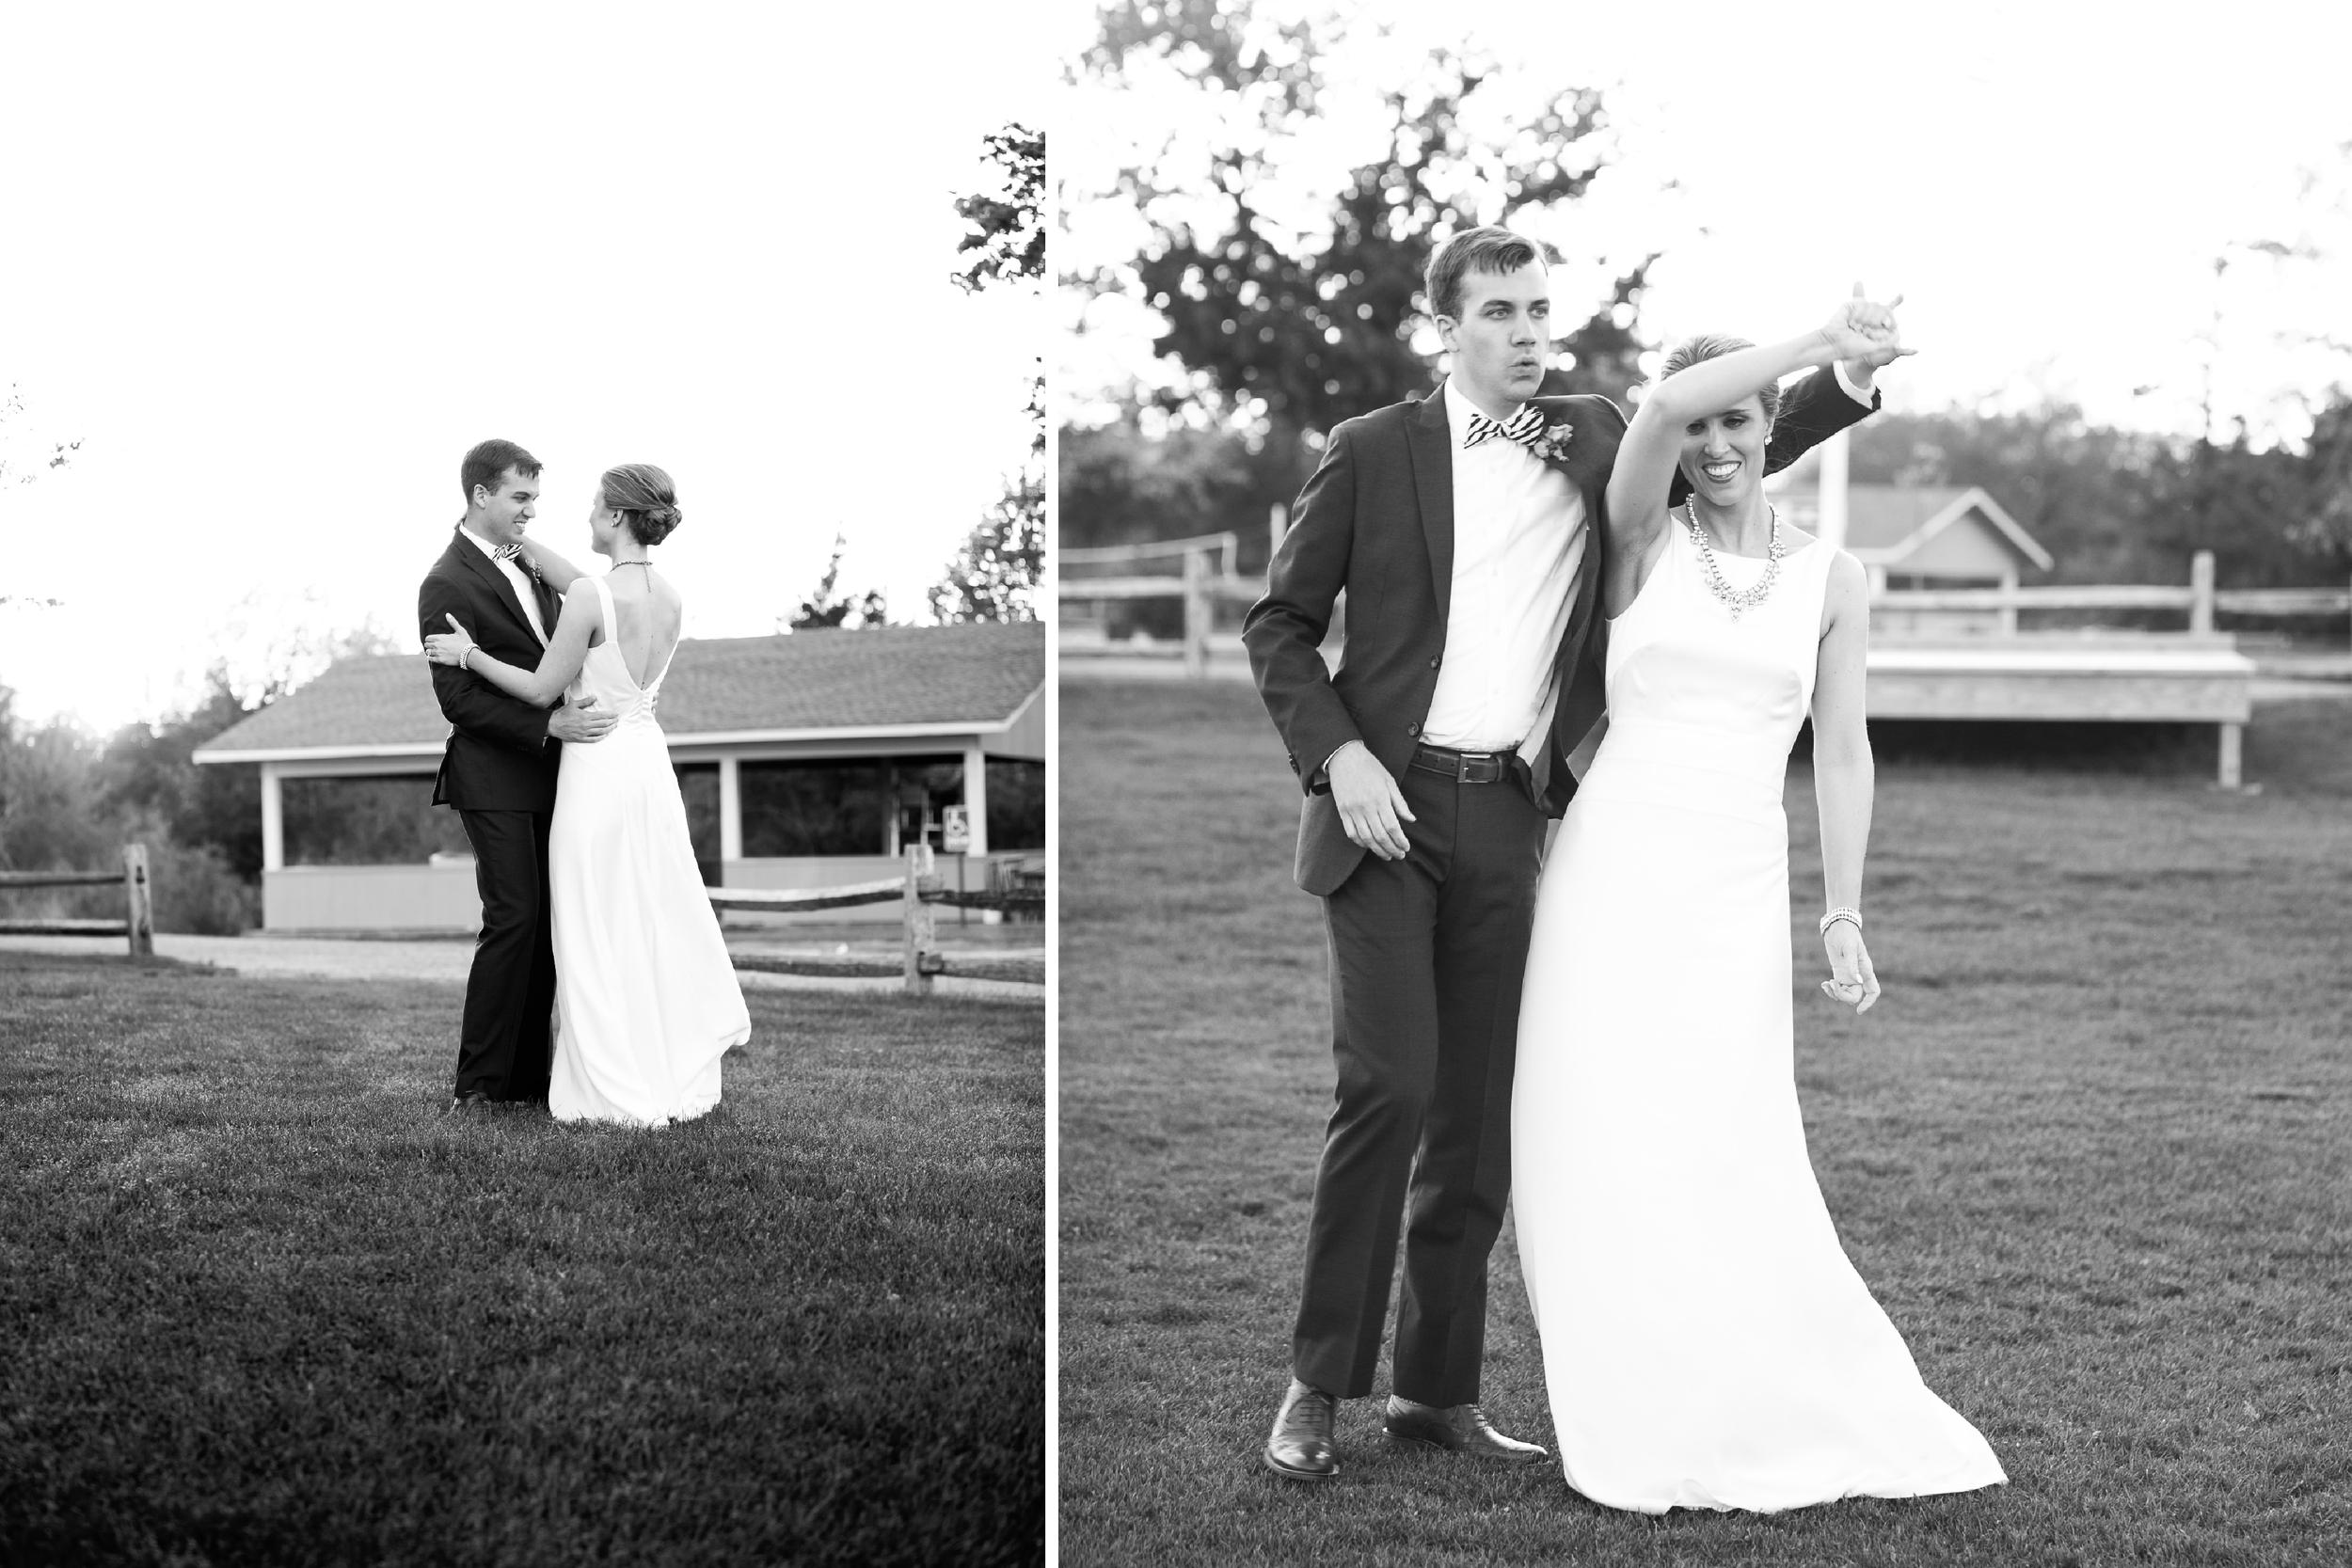 Tracy_Rodriguez_Photography_WeddingPort_TimAnnie_Horz-6.jpg